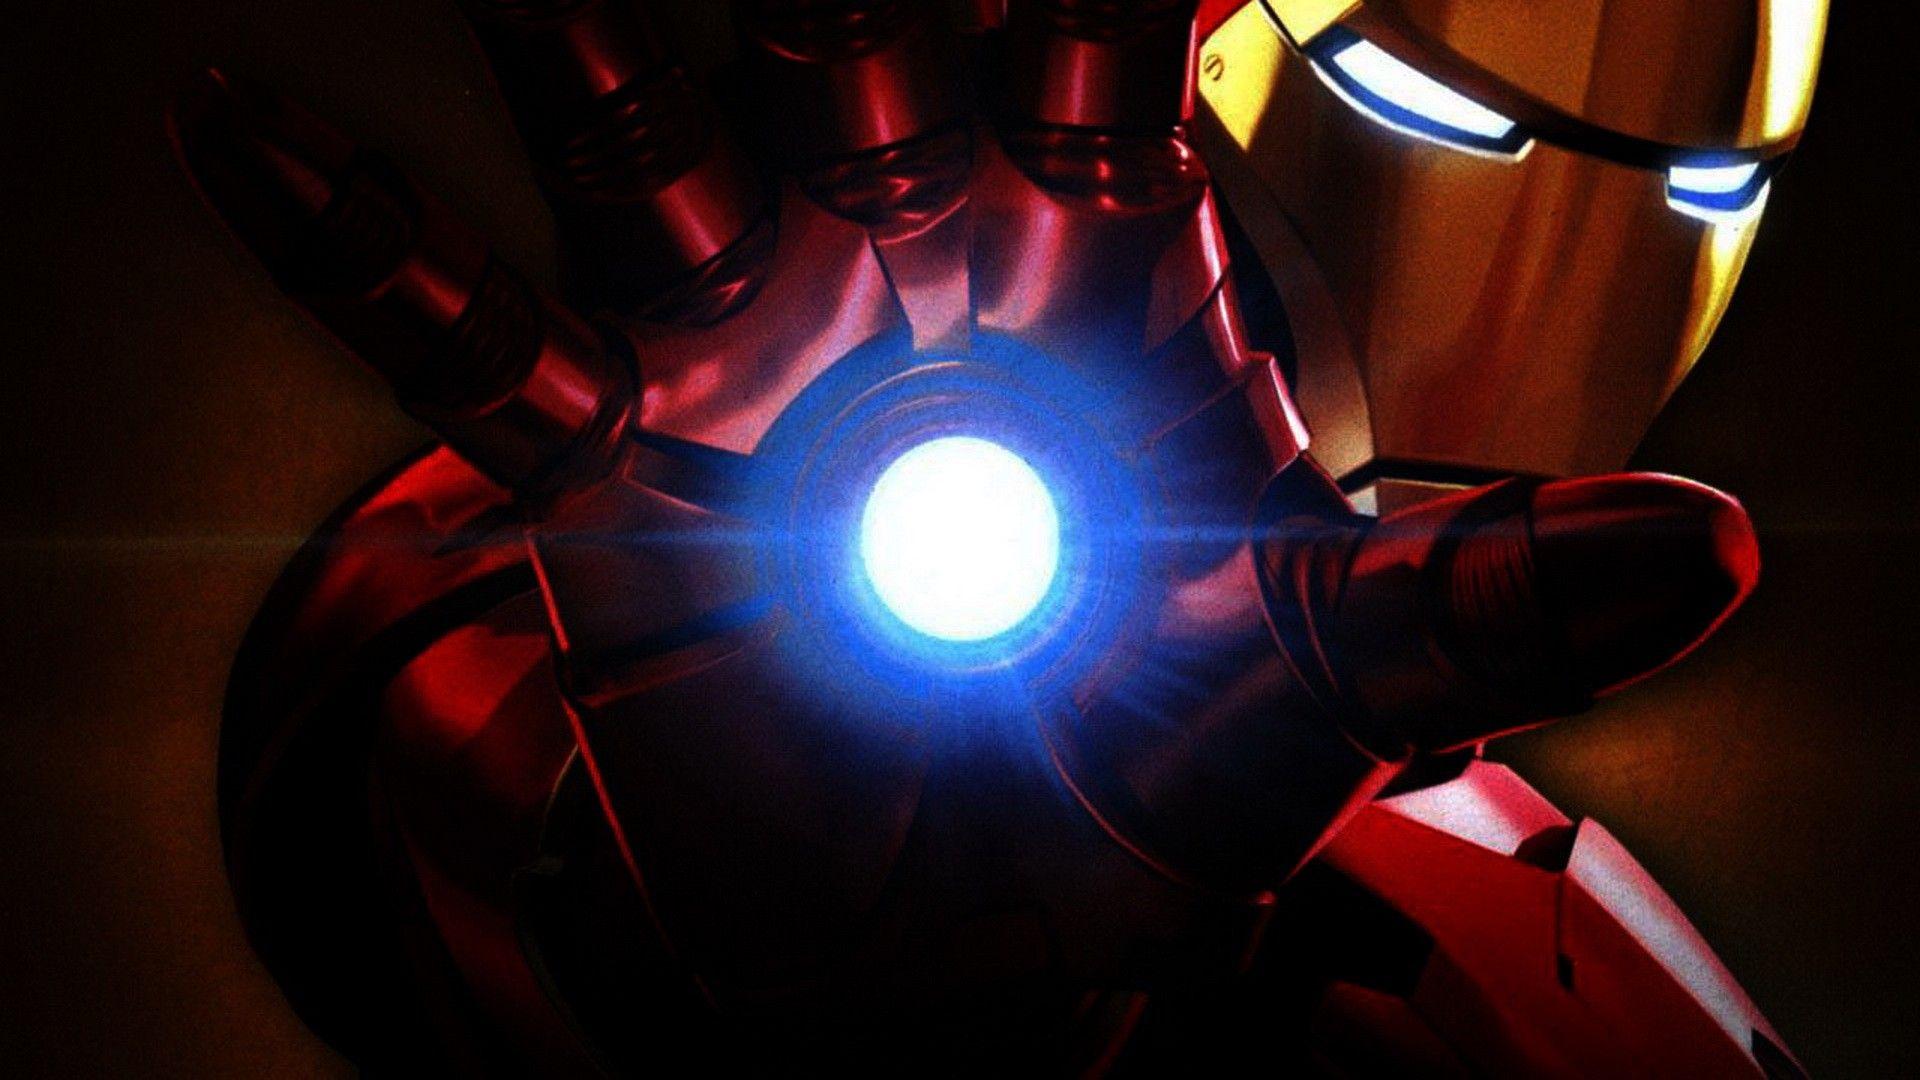 Iron Man 3 1080 Hd 4k Background 8 Freehighresolutionimages Org Iron Man Wallpaper Marvel Comics Wallpaper Iron Man Hd Wallpaper